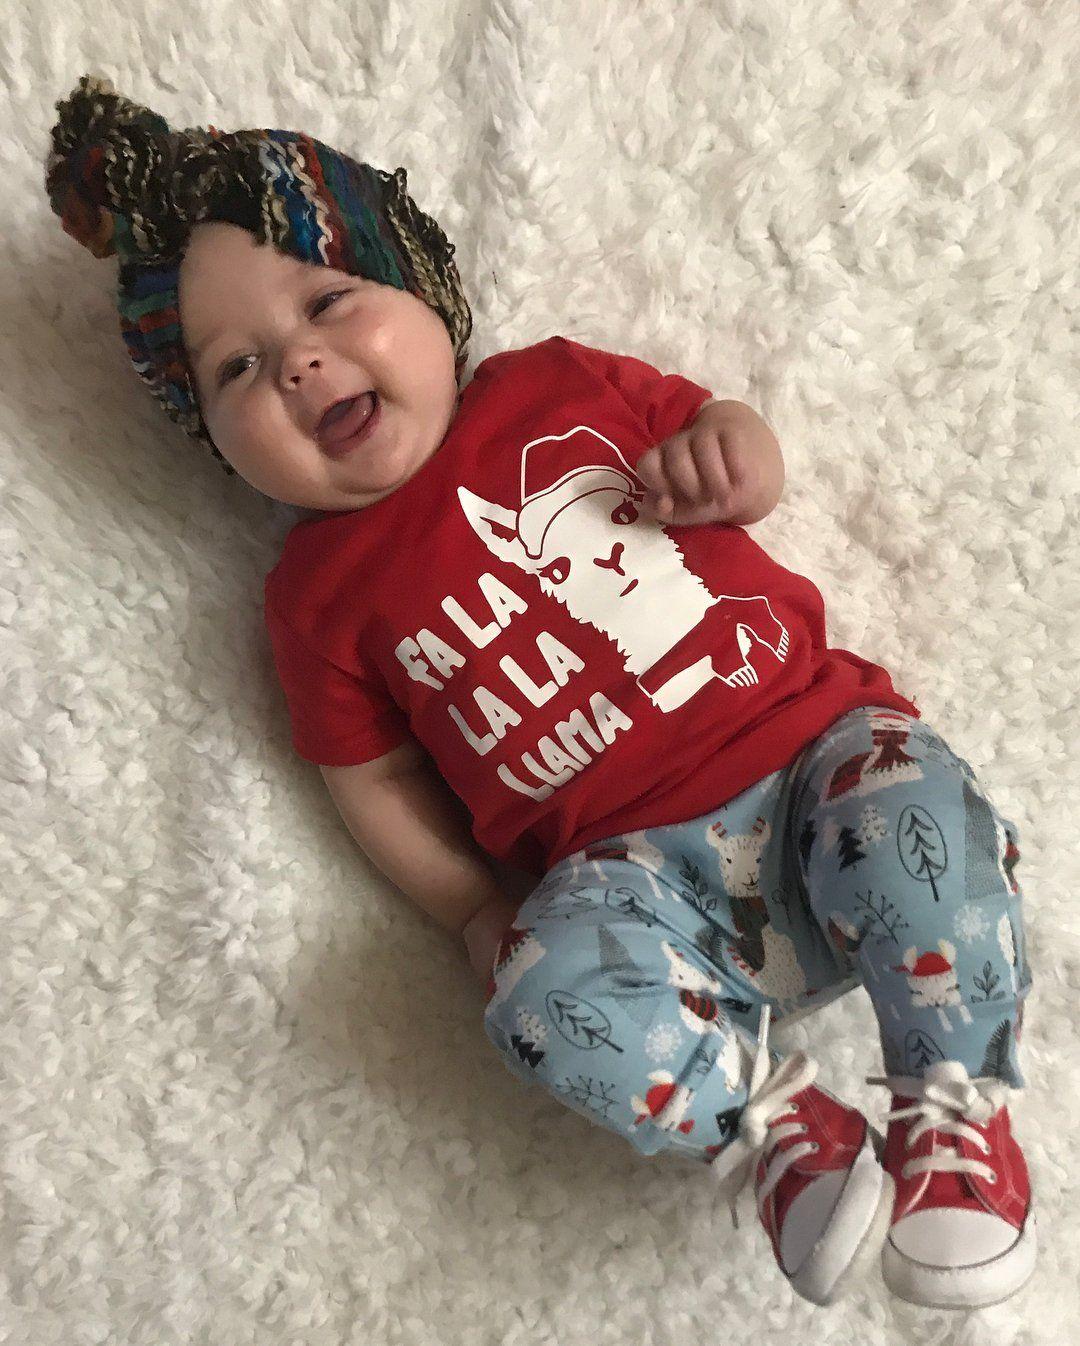 is My Bike Okay Toddler Short-Sleeve Tee for Boy Girl Infant Kids T-Shirt On Newborn 6-18 Months